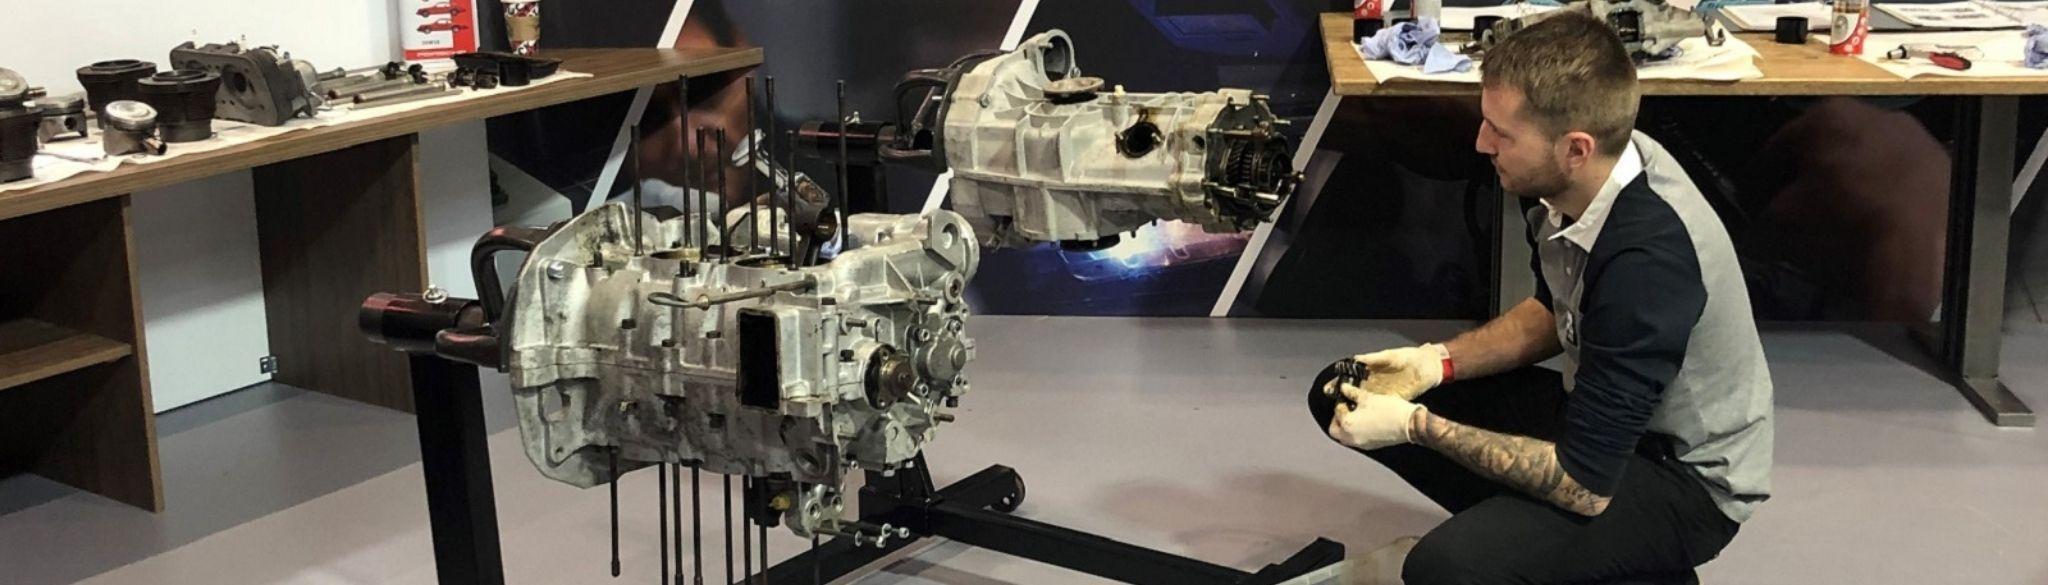 Luke Rebuilding Engine